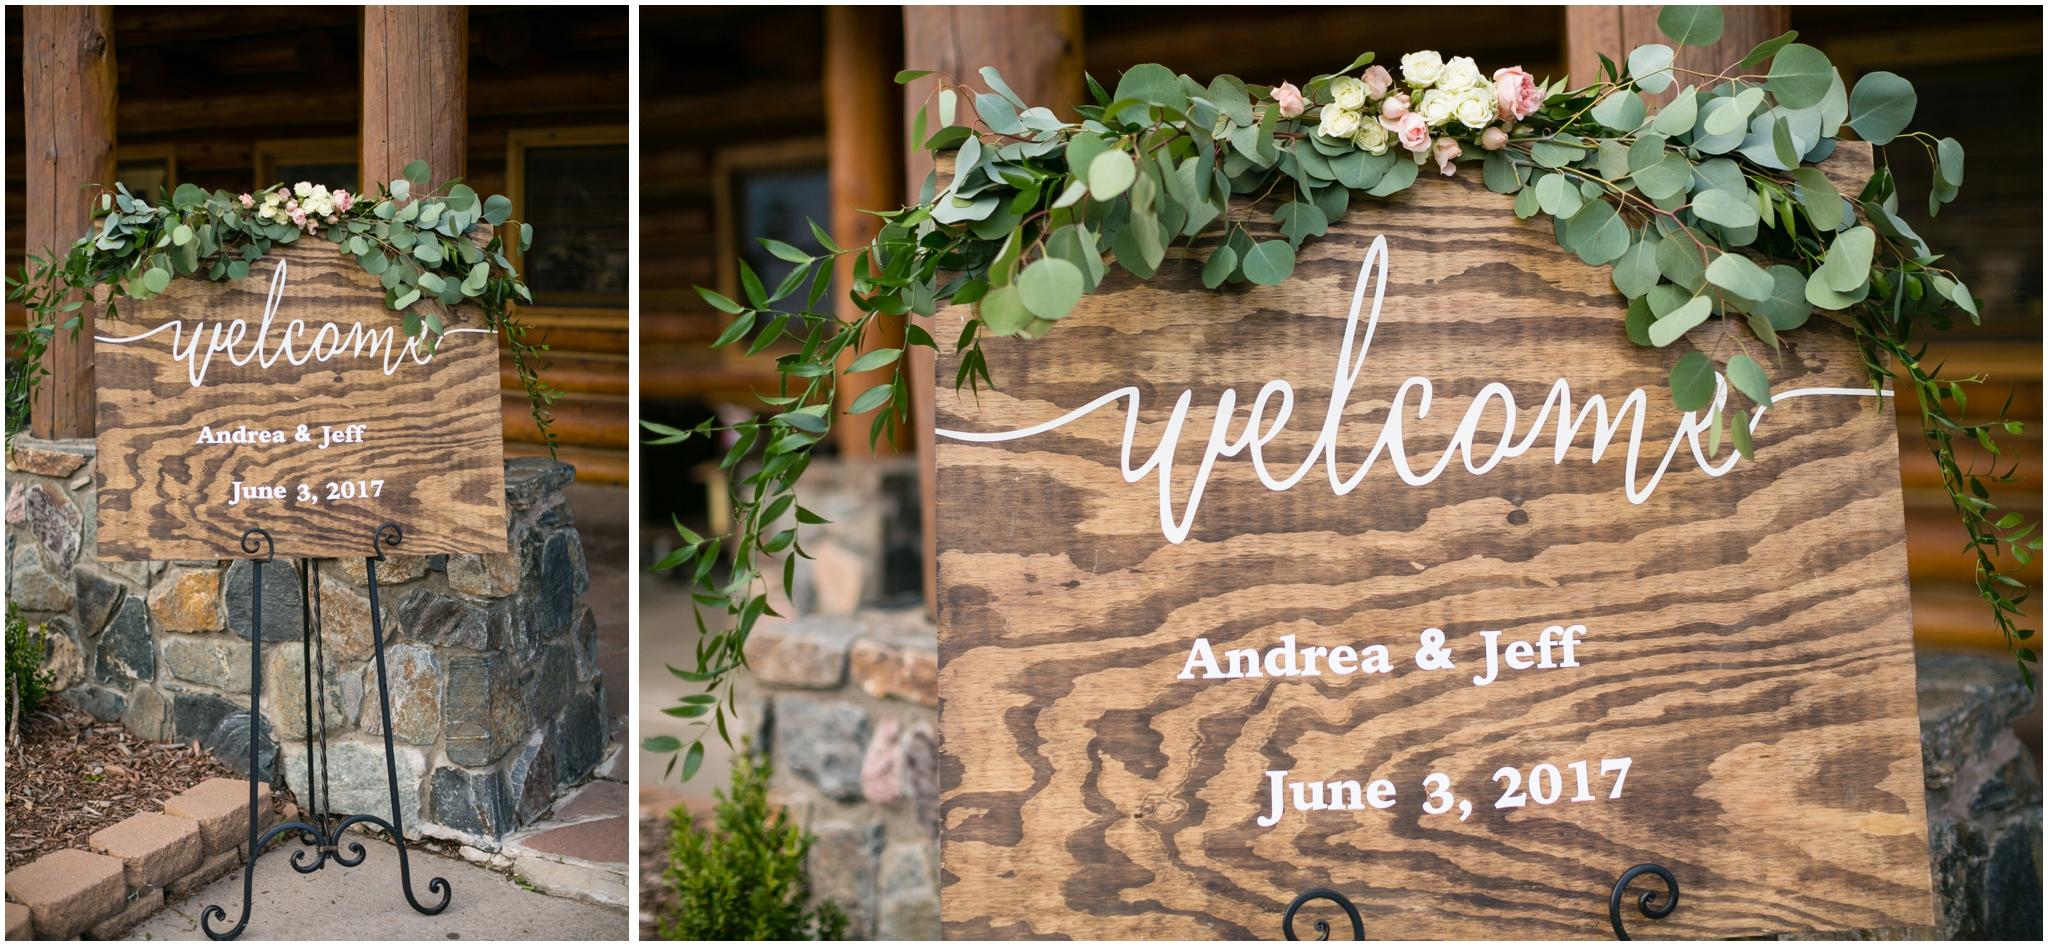 Denver_Wedding_Photography_Wedding_signs.JPG